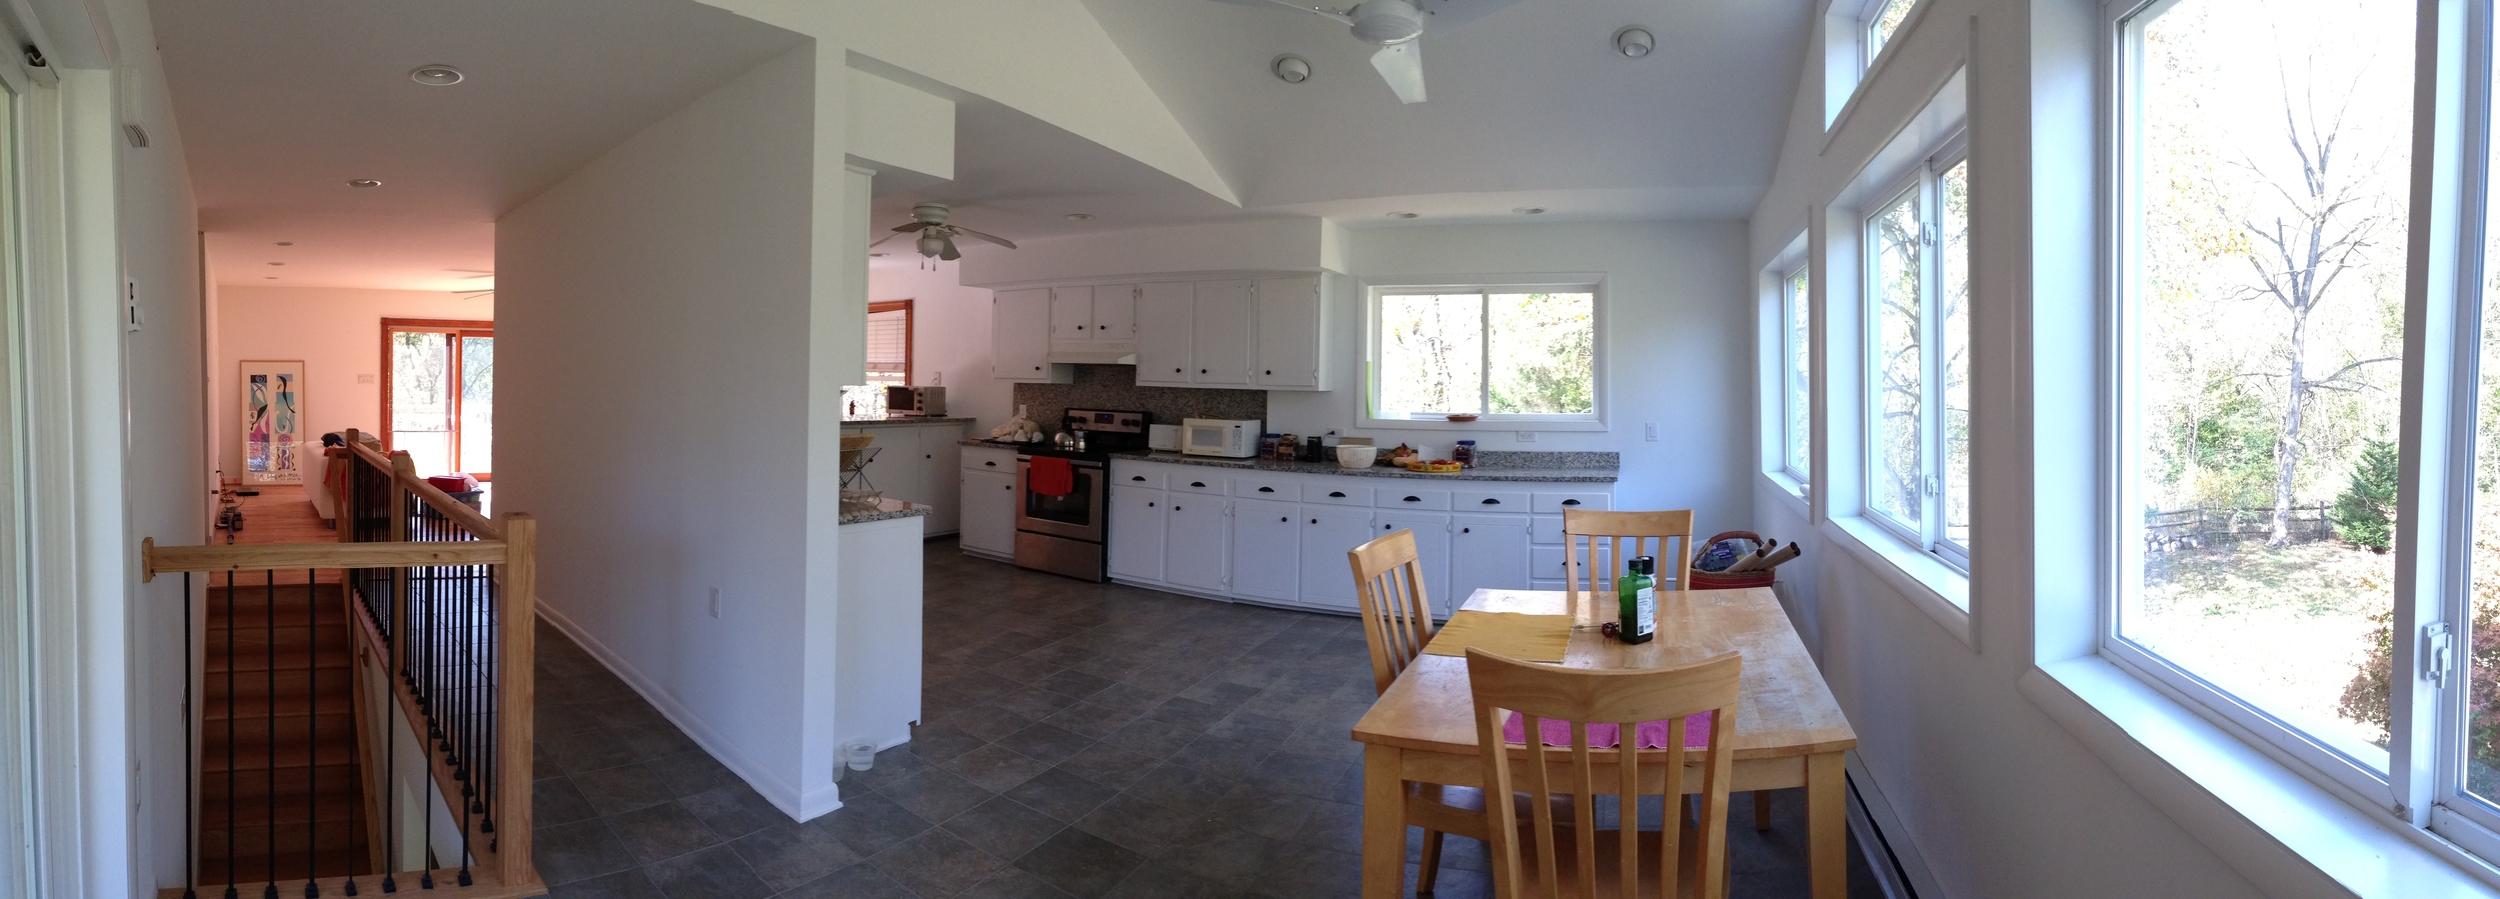 Sunroom Additions Fine Line Home Design Llc